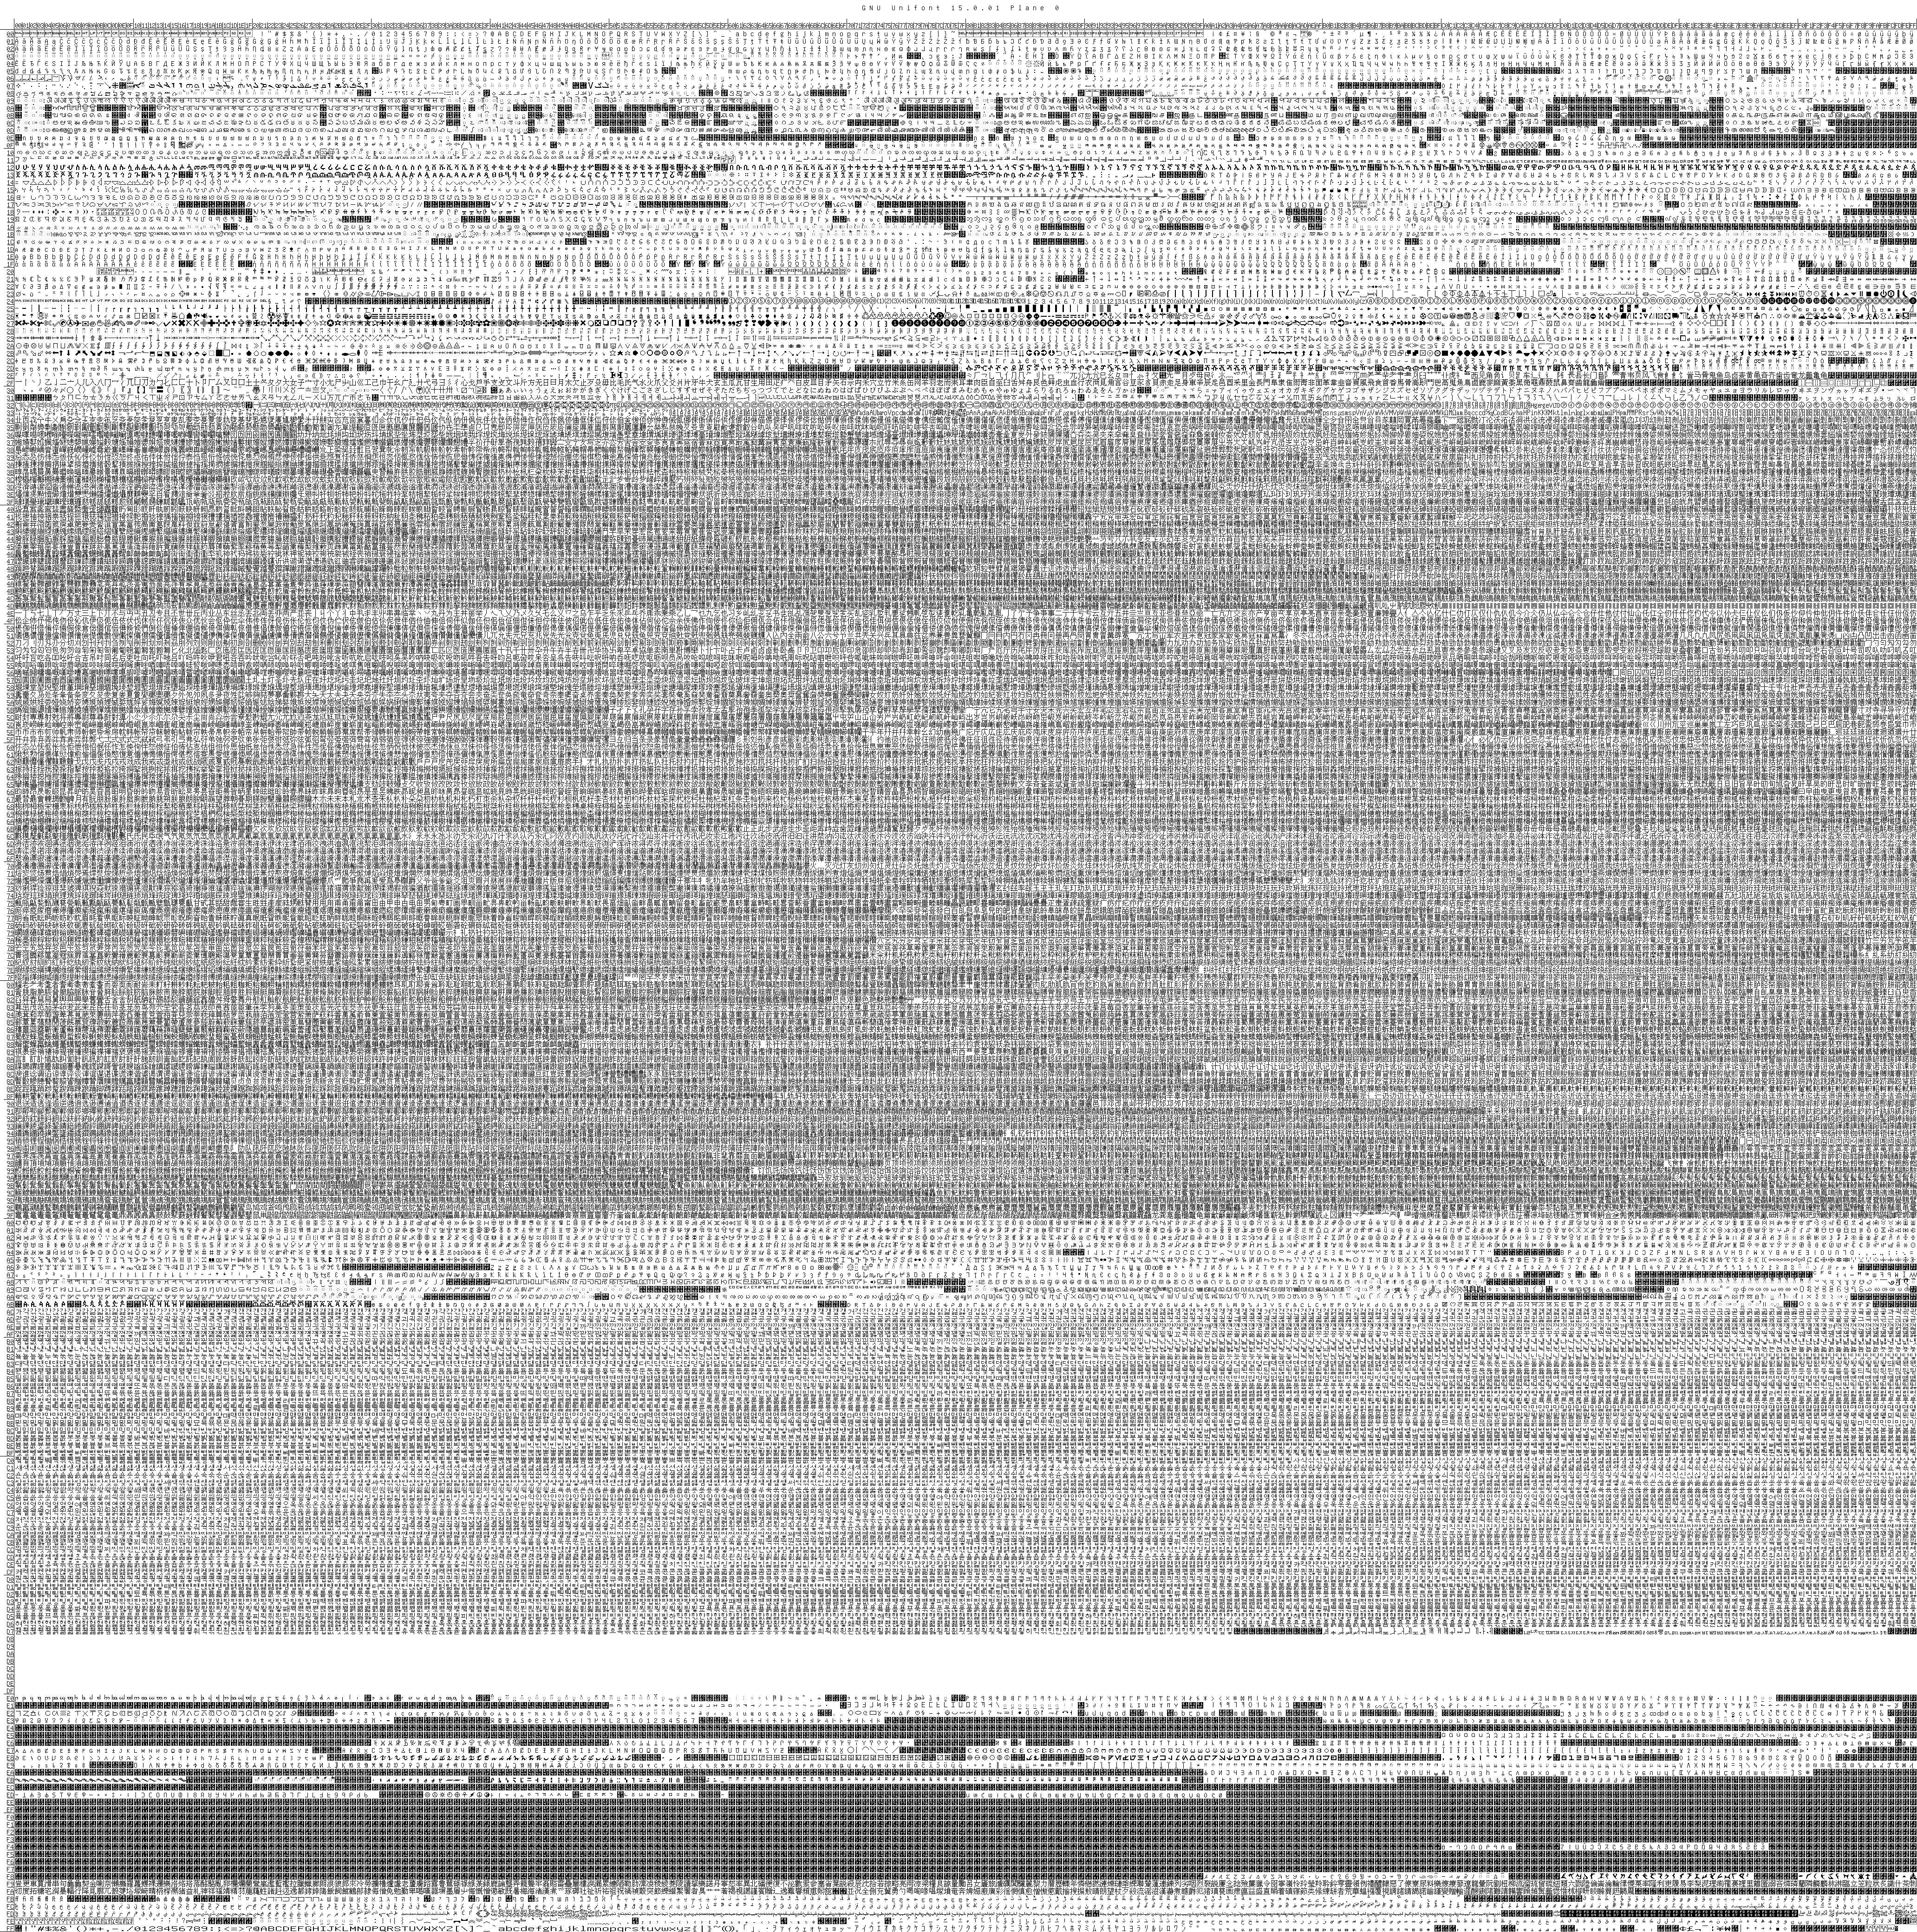 megesco bináris opció